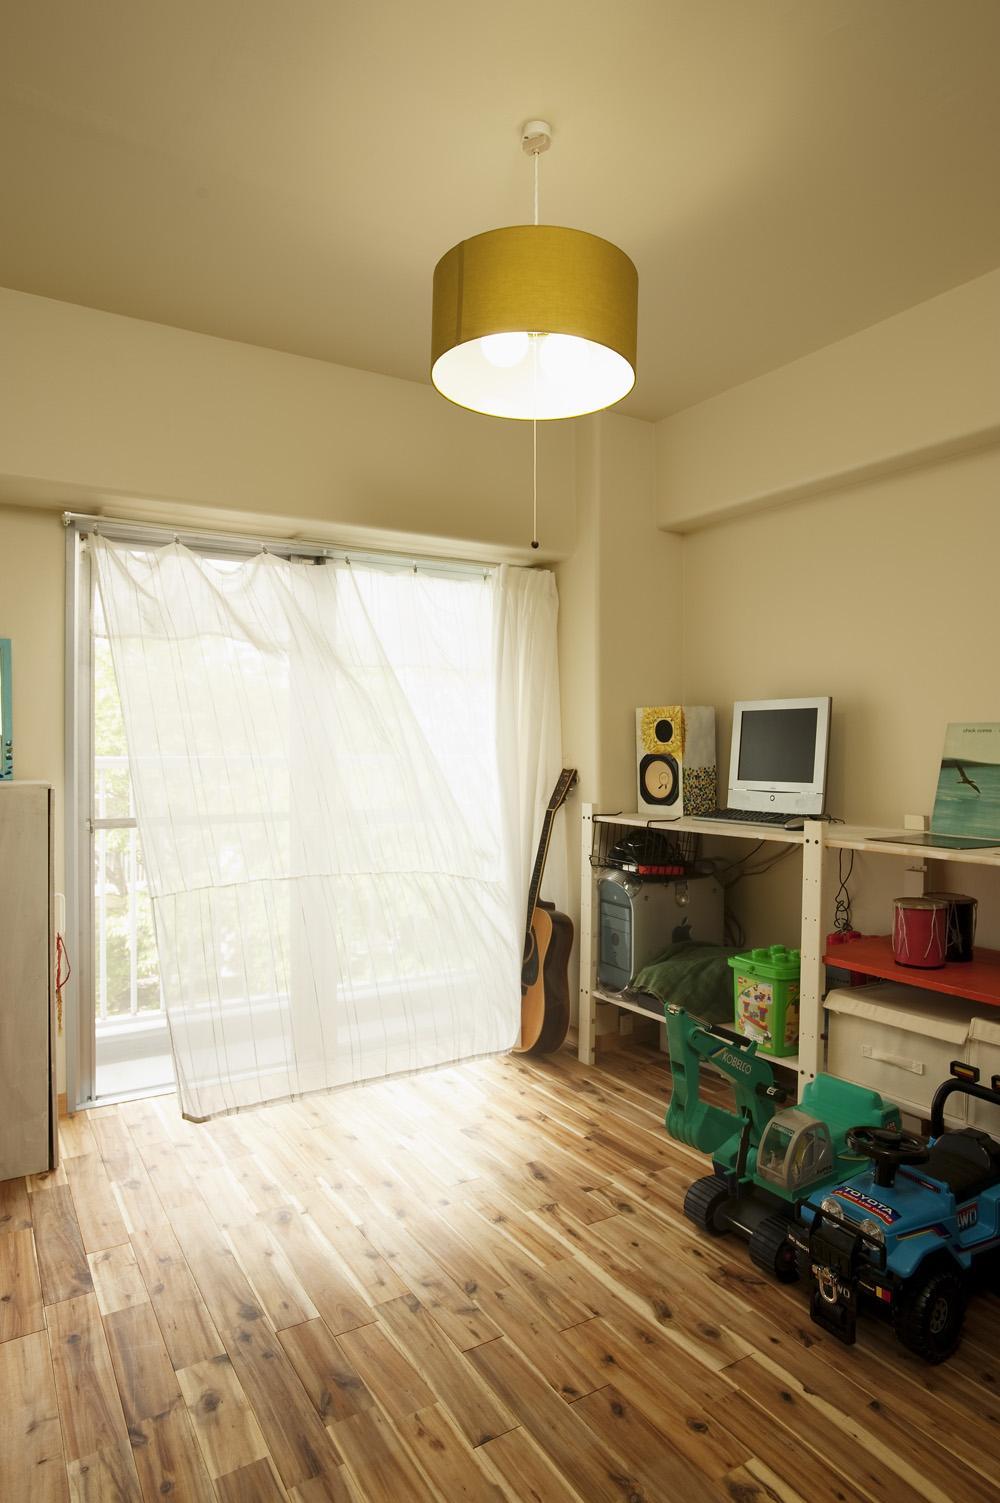 H邸・ハンモックのゆれる、光と風のリビングの部屋 光と風を取り込む子供部屋